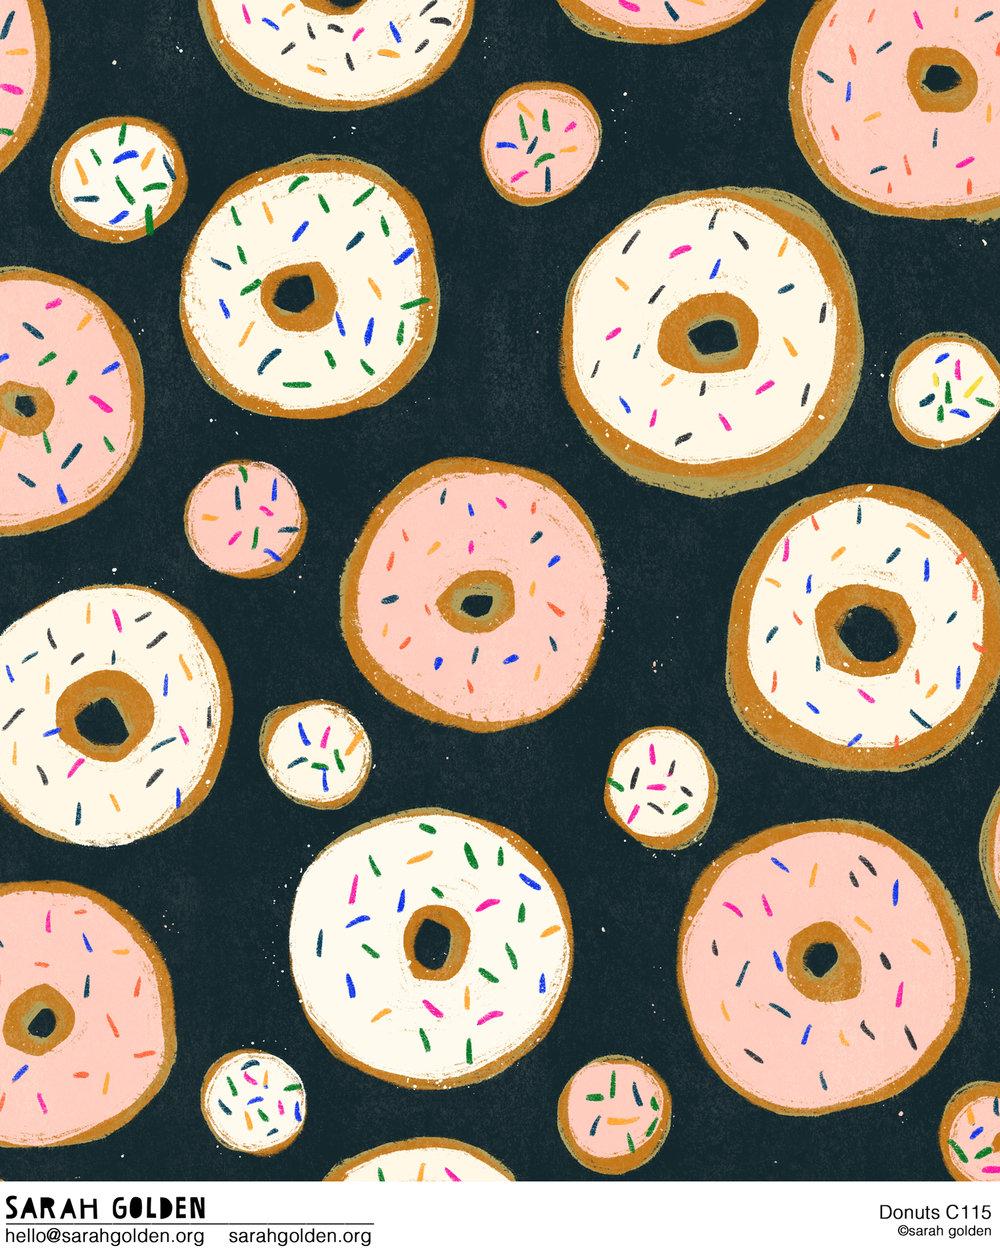 Donuts_C115_Catalog_Sarah_Golden_logo_web.jpg